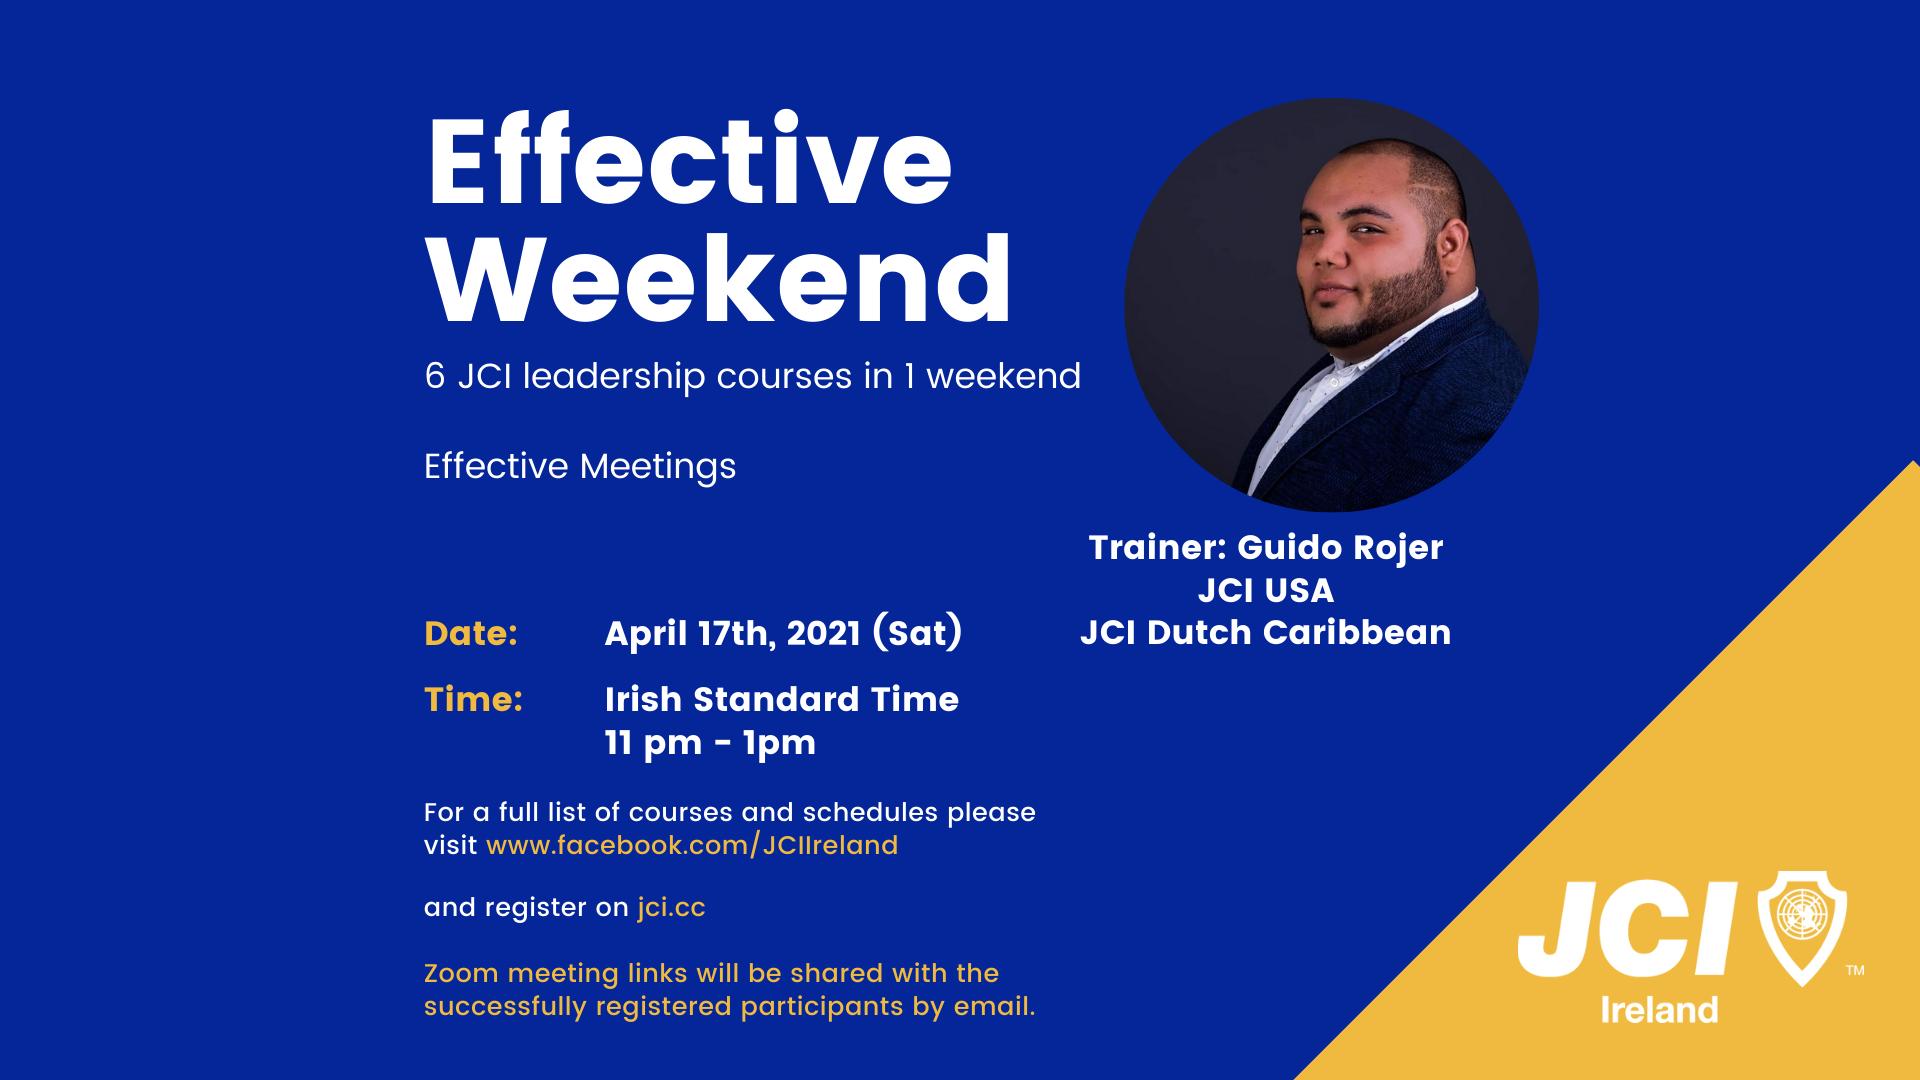 Effective Weekend 2021 - Effective Meetings